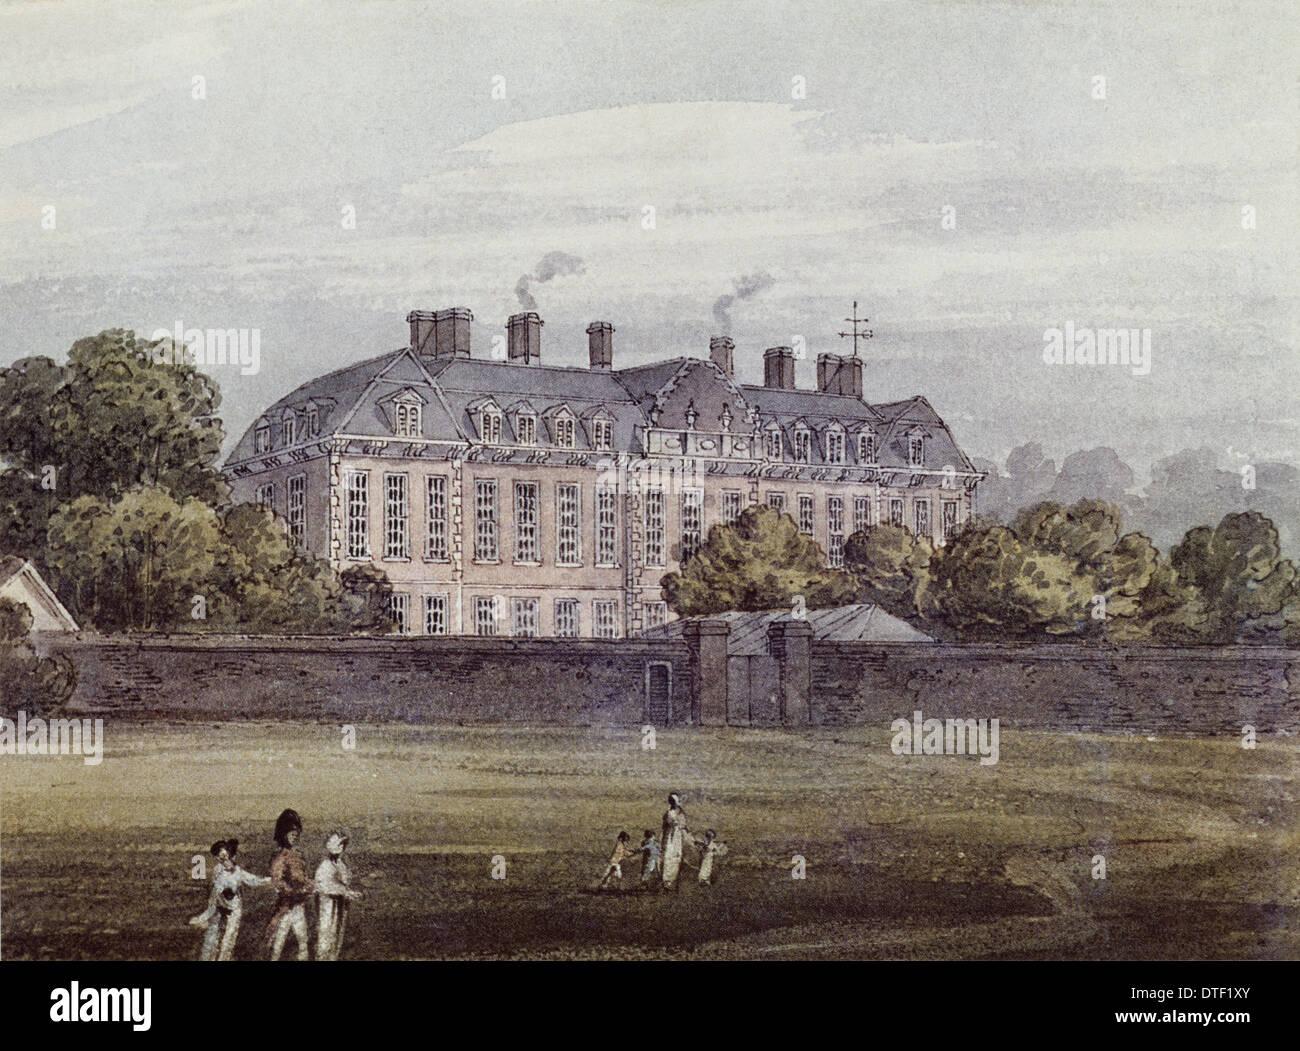 Montagu House, Bloomsbury - Stock Image